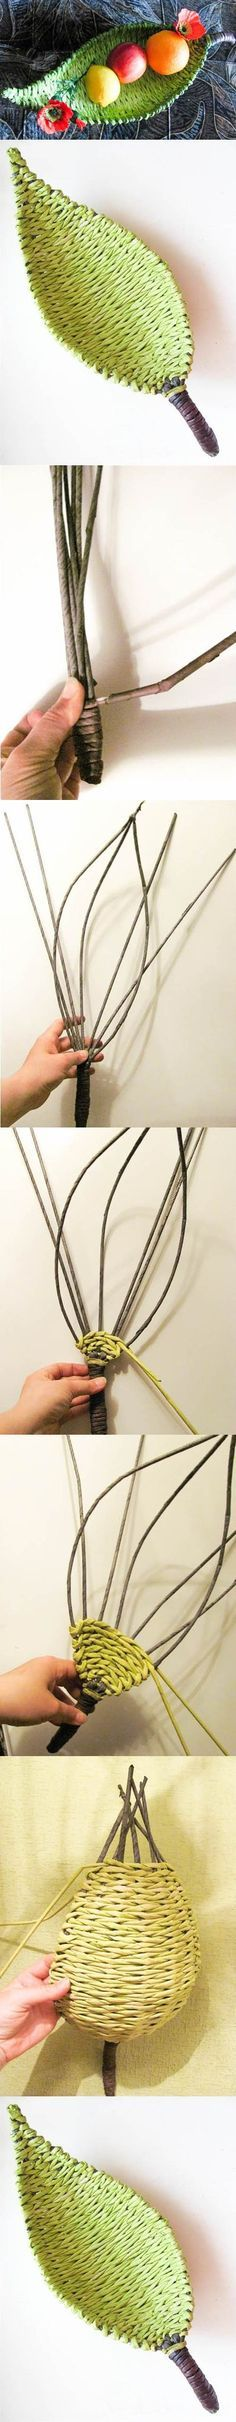 DIY Beautiful Paper Woven Tray | iCreativeIdeas.com Like Us on Facebook ==> https://www.facebook.com/icreativeideas